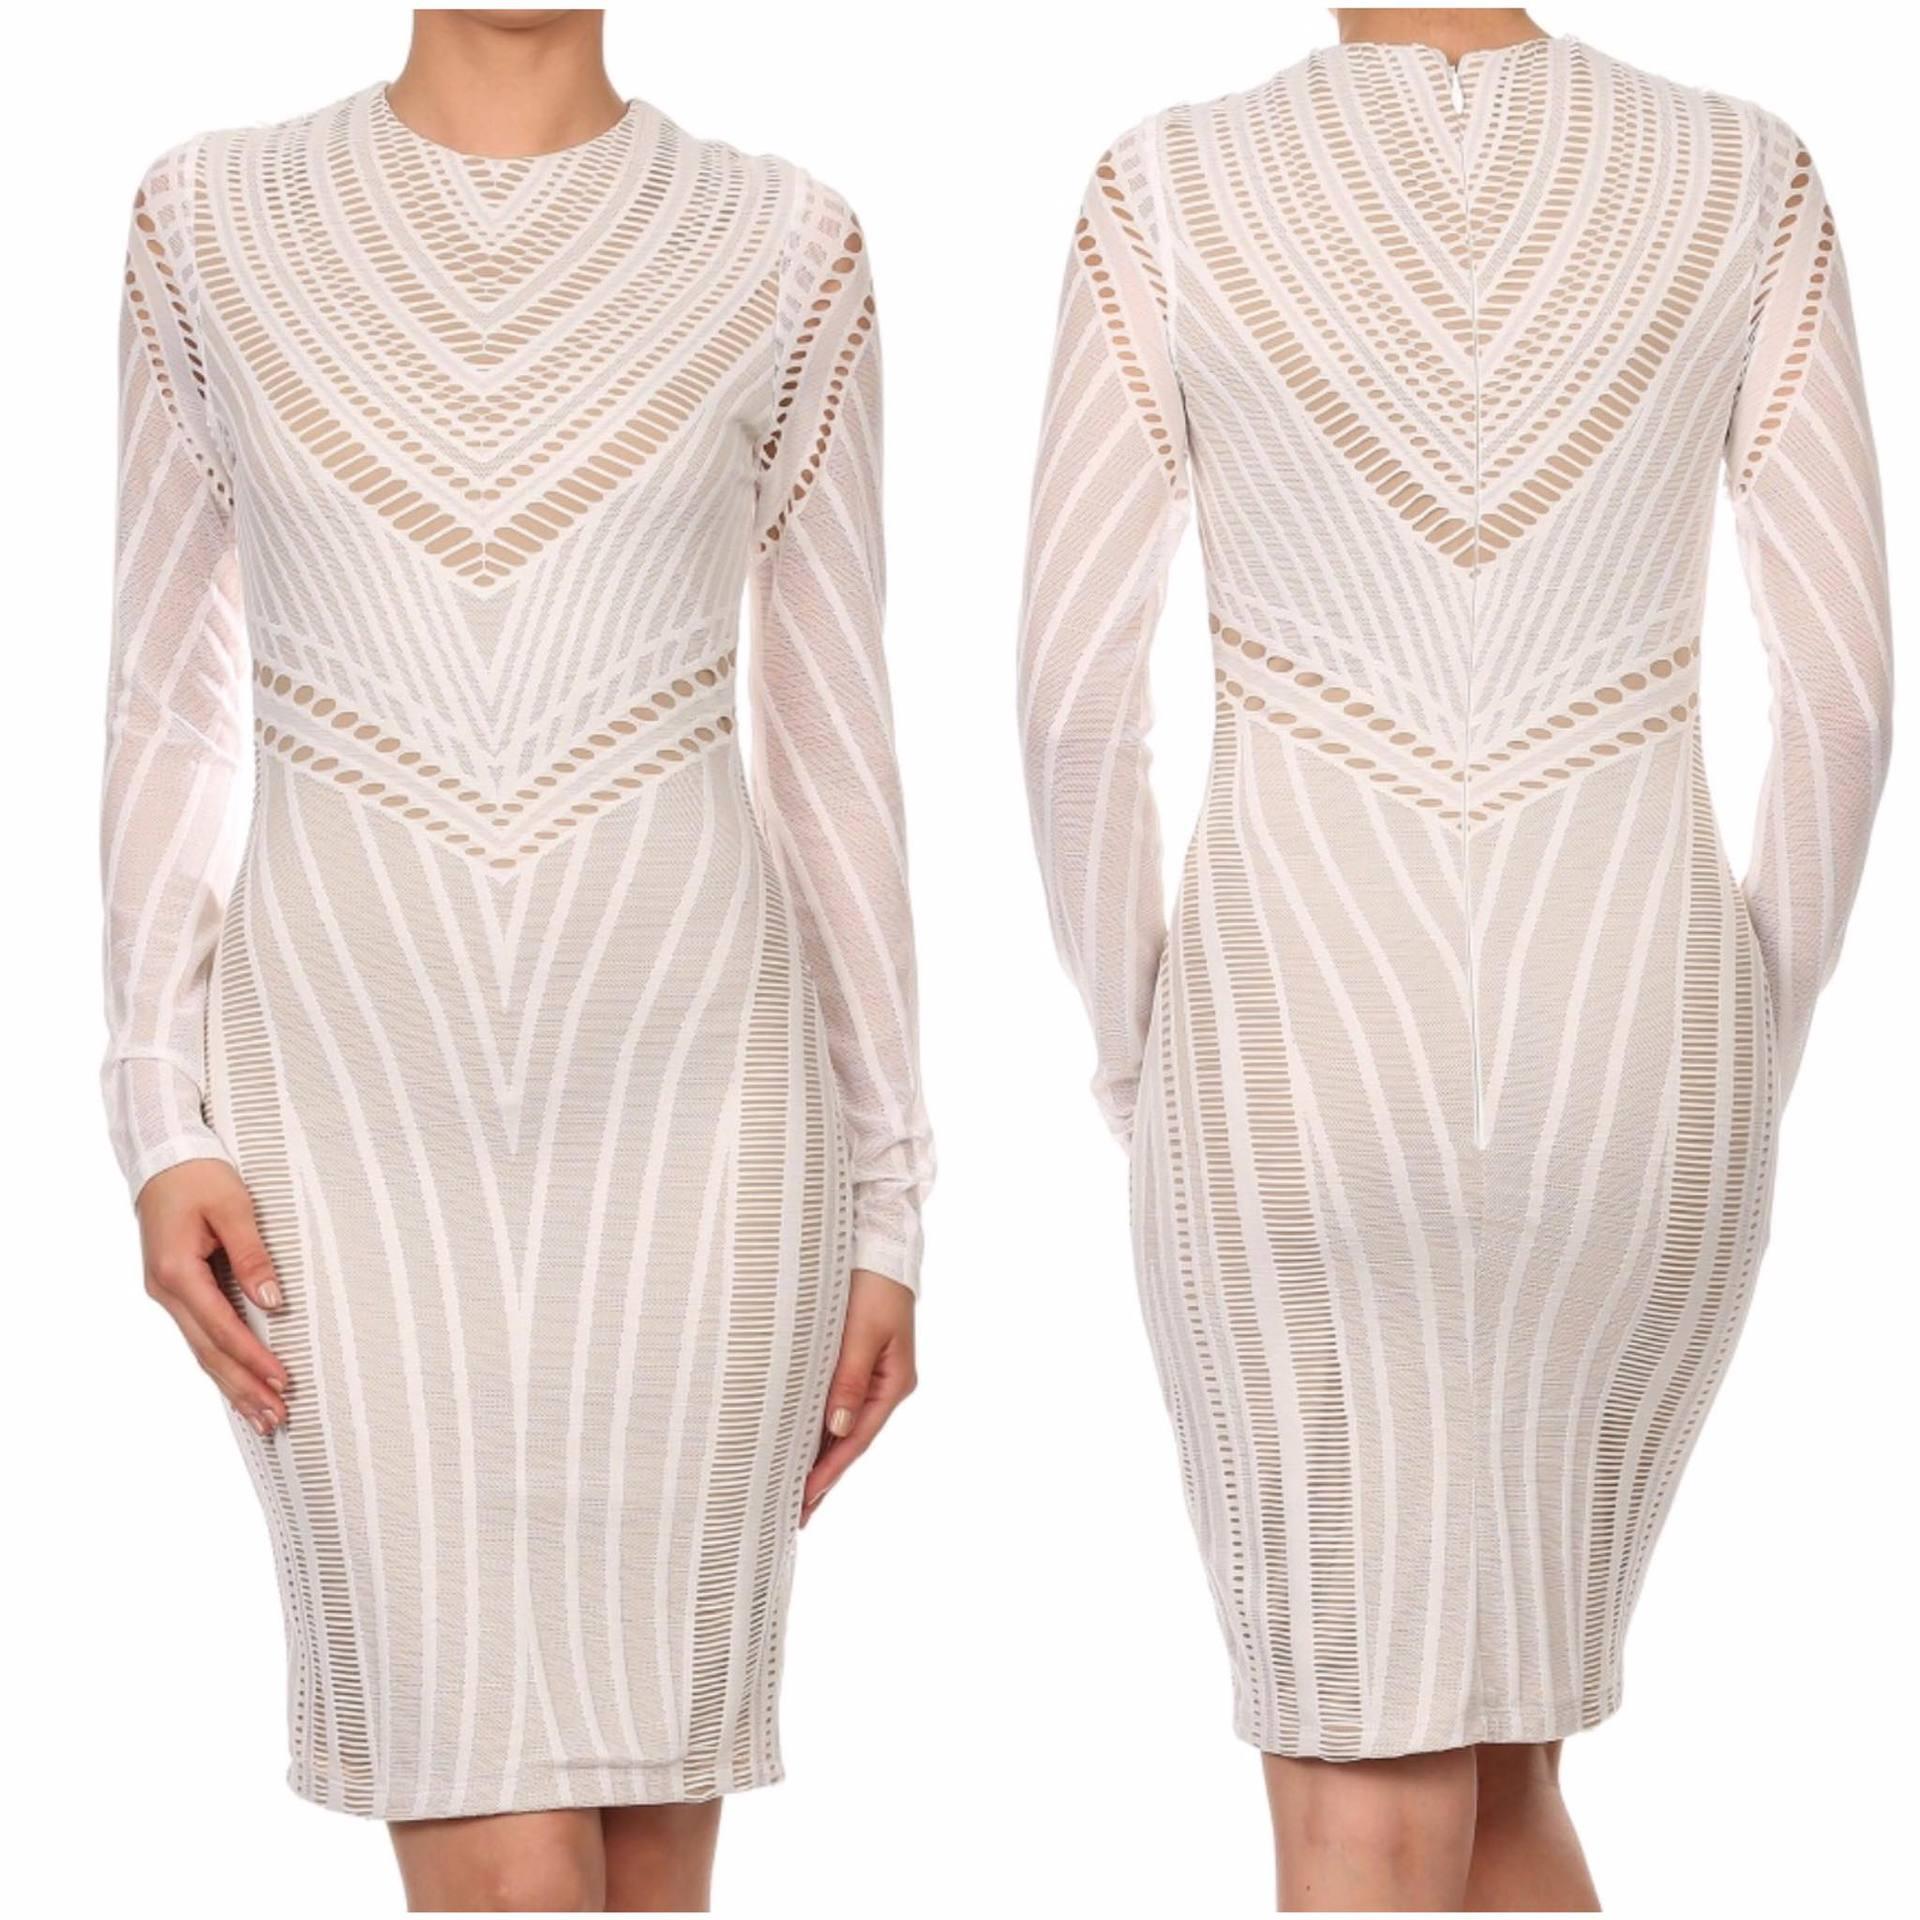 White/nude short dress